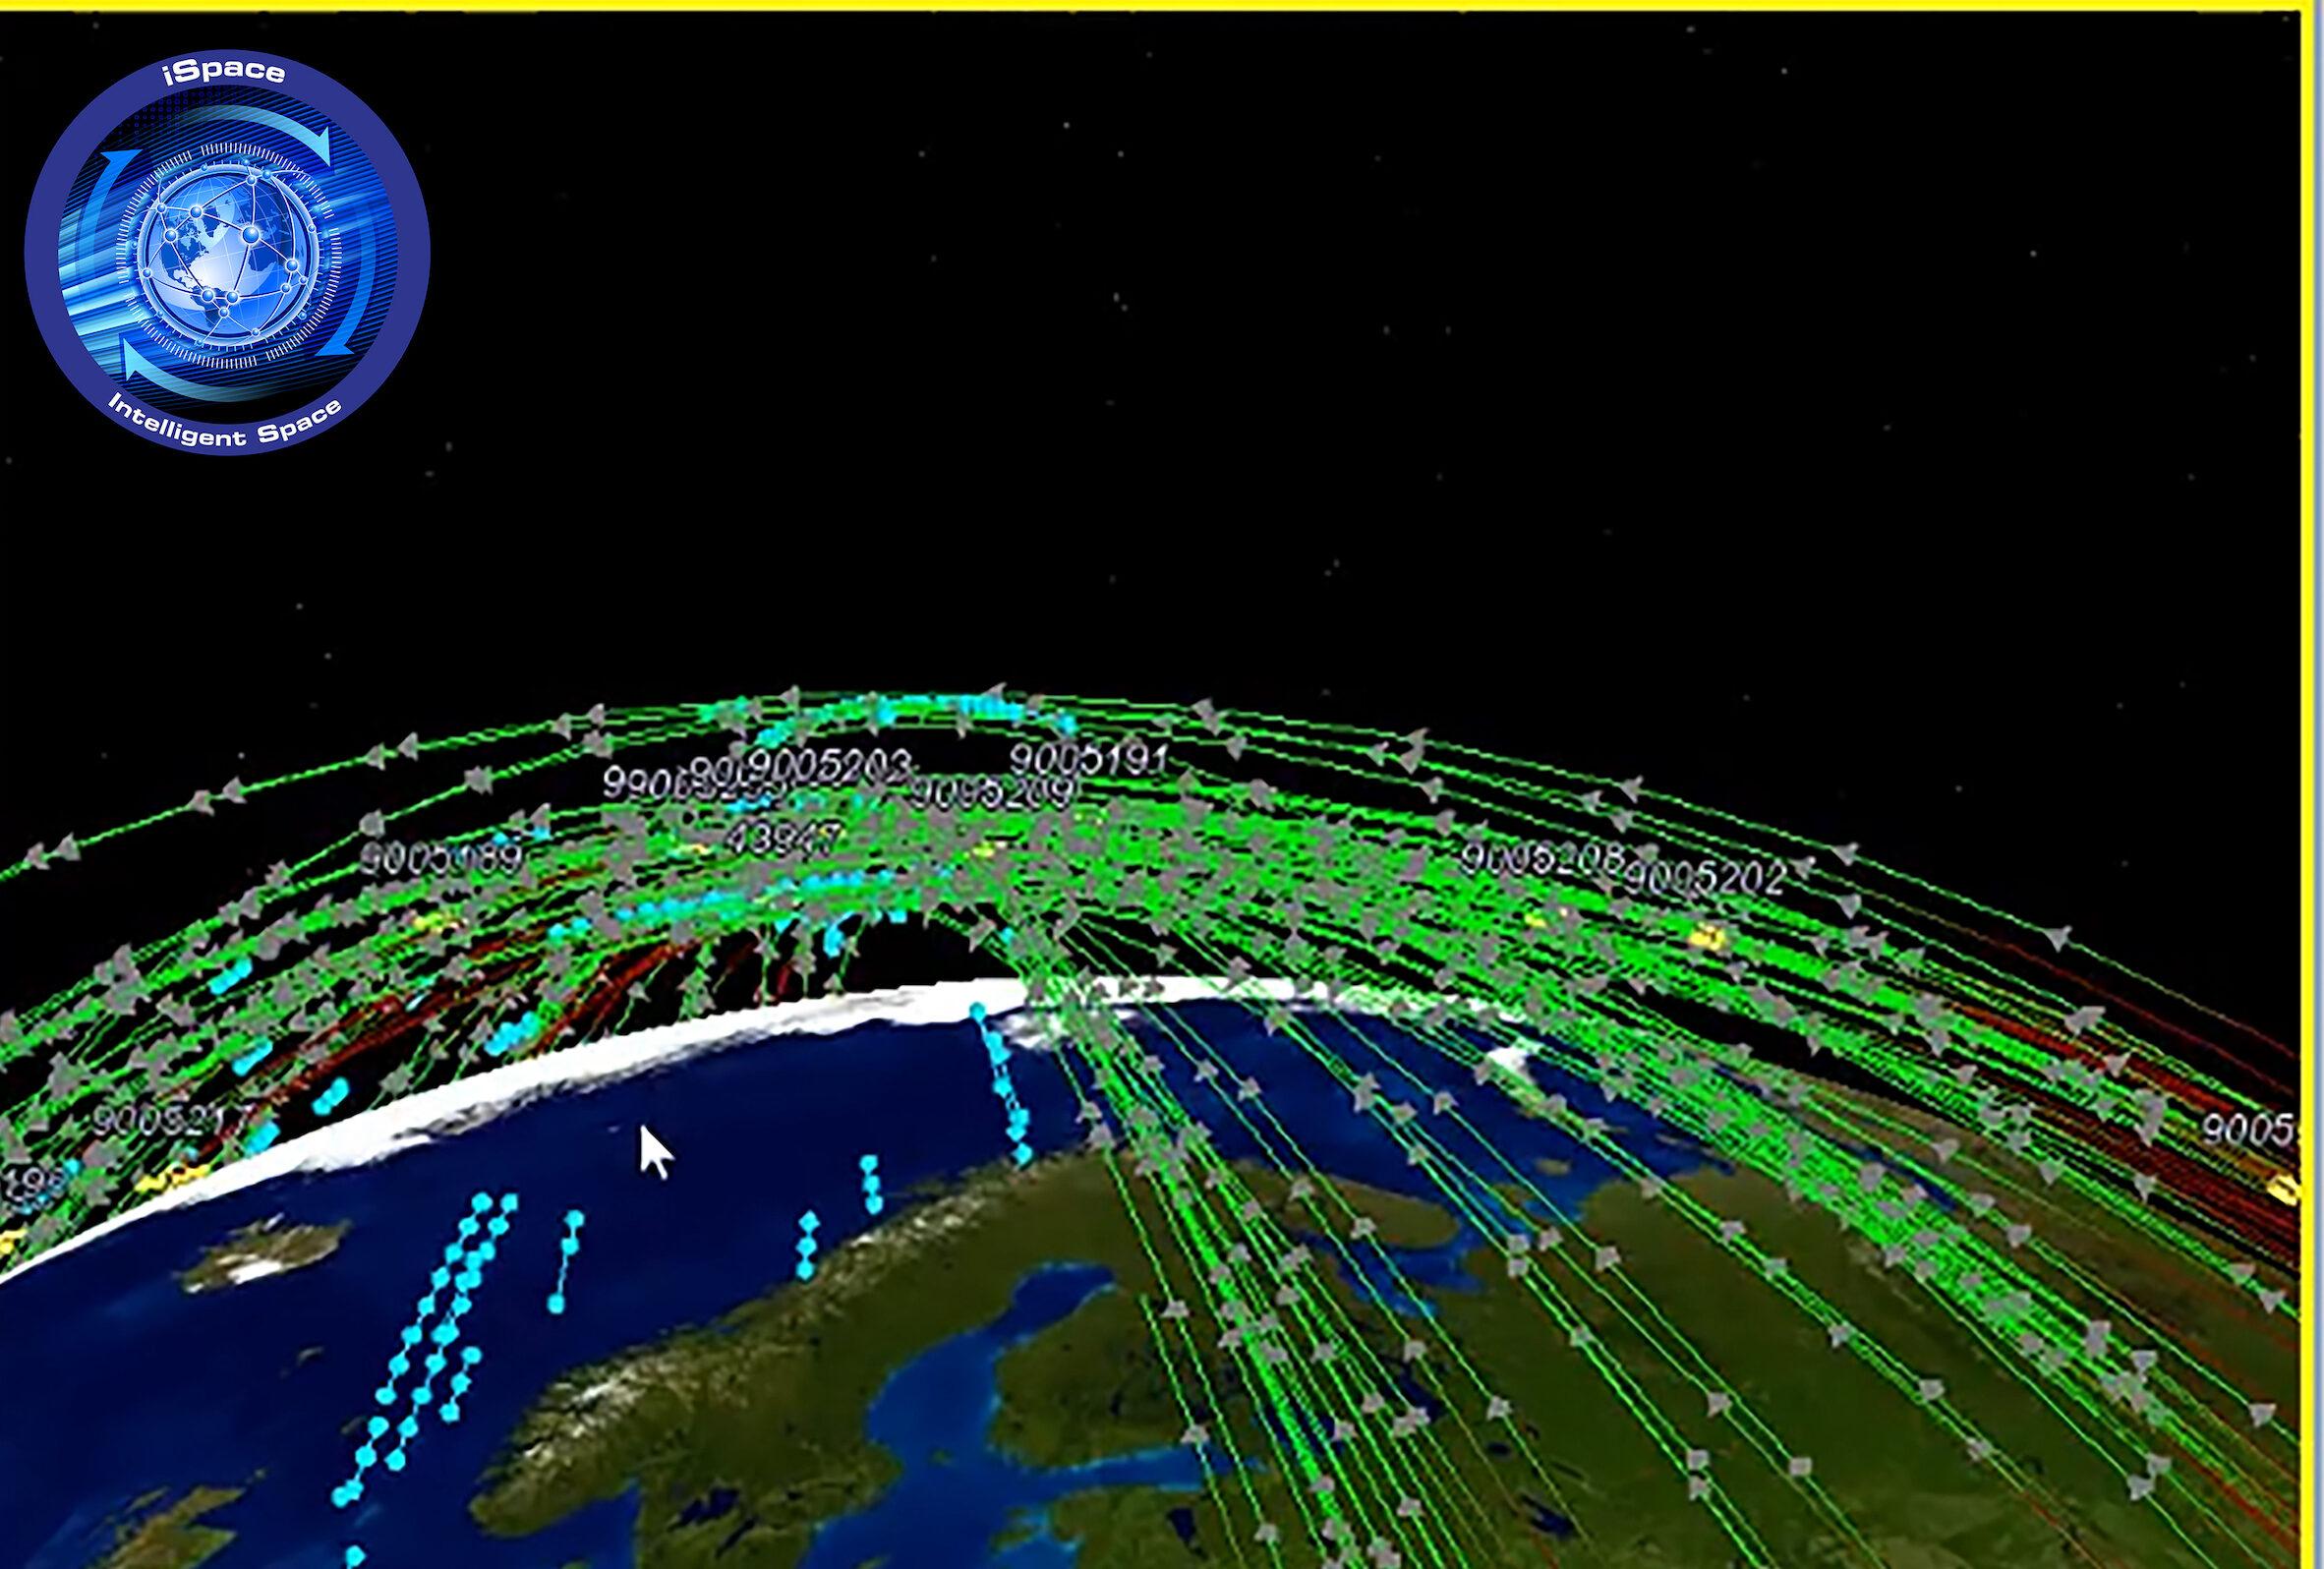 Lockheed Martin iSpace screen shot e1617641544975.